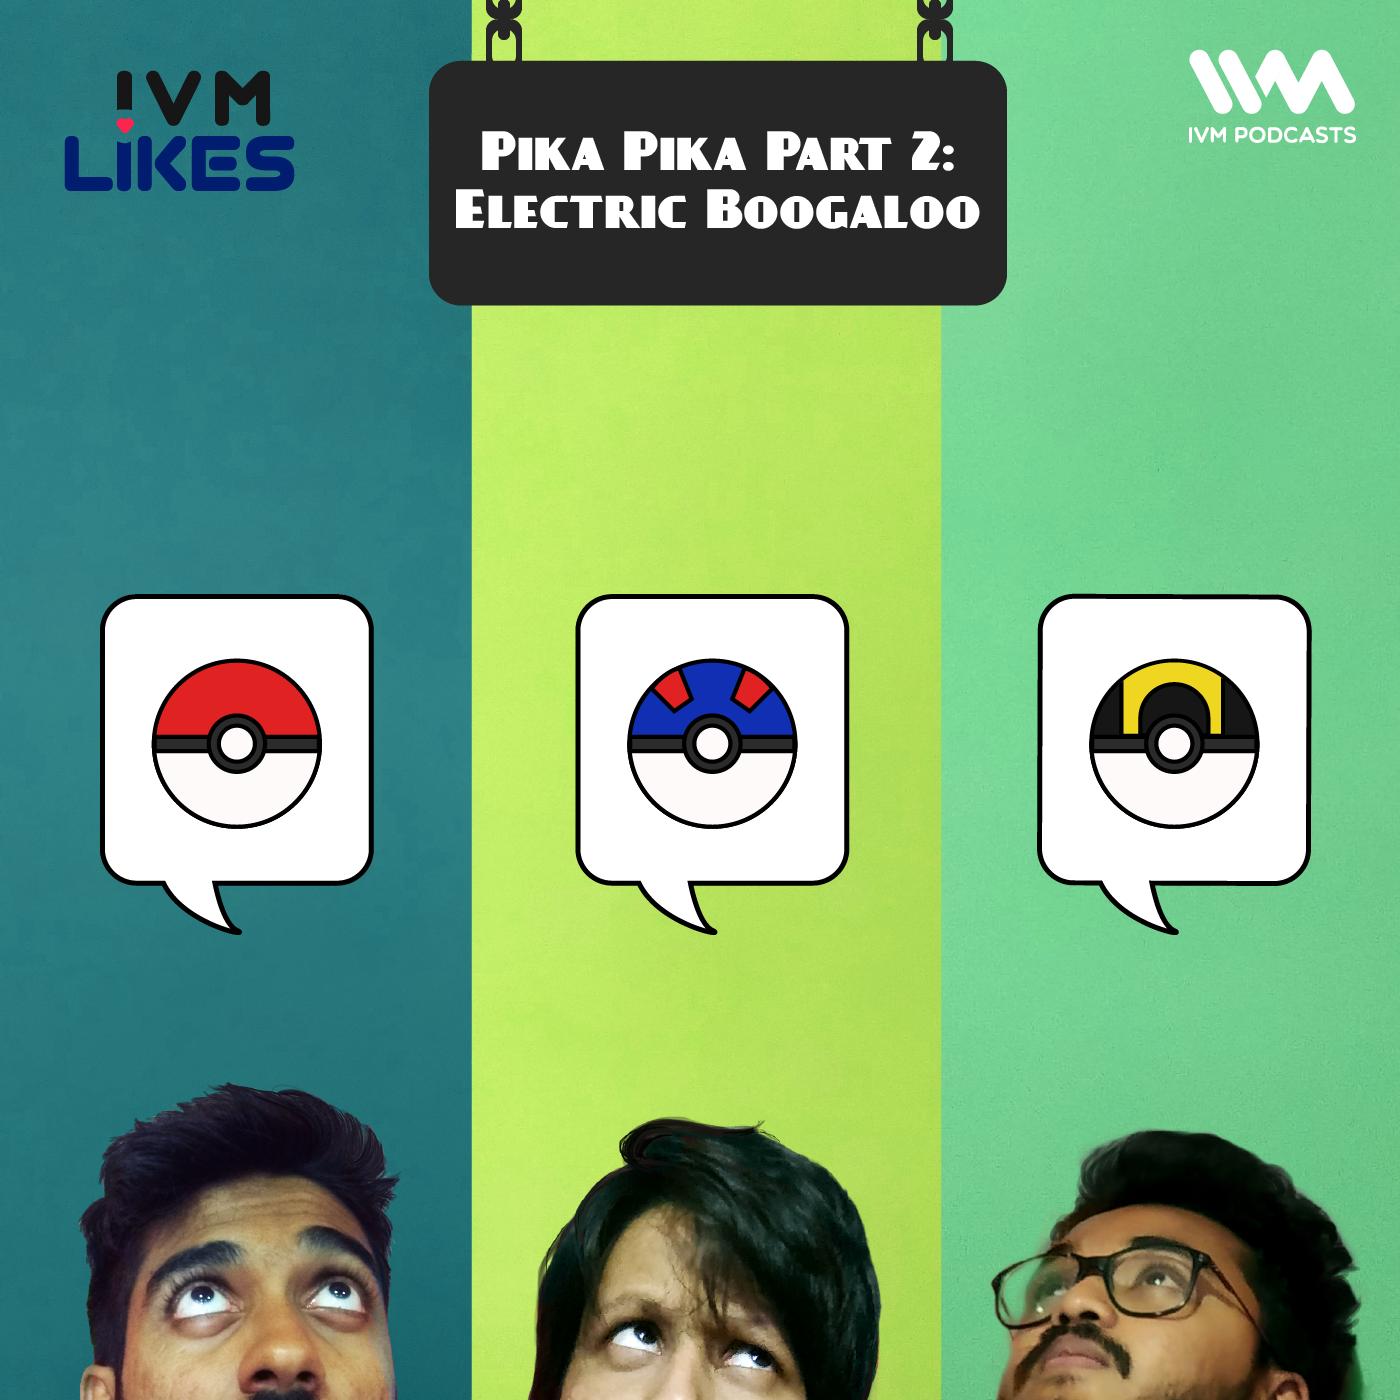 Ep. 122: Pika Pika Part 2: Electric Boogaloo